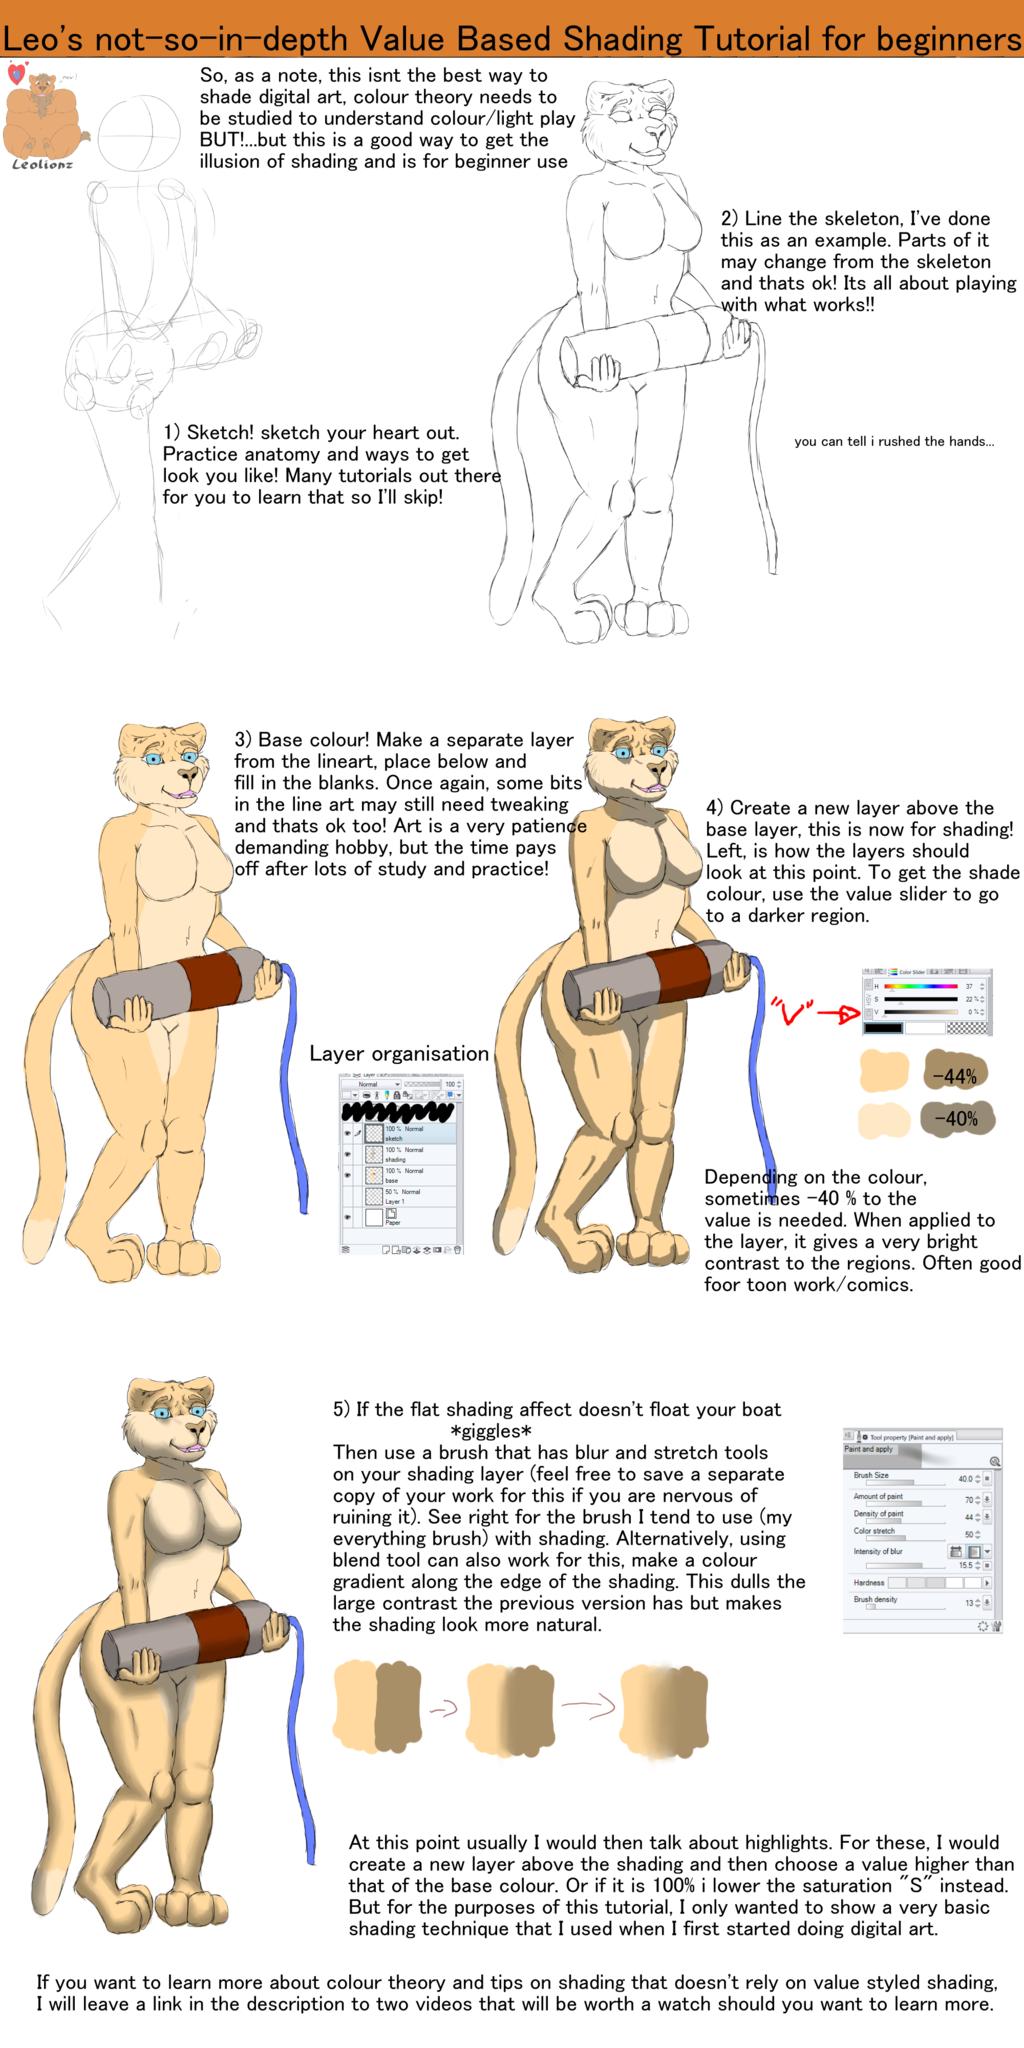 Leo's Value based Shading guide for beginners